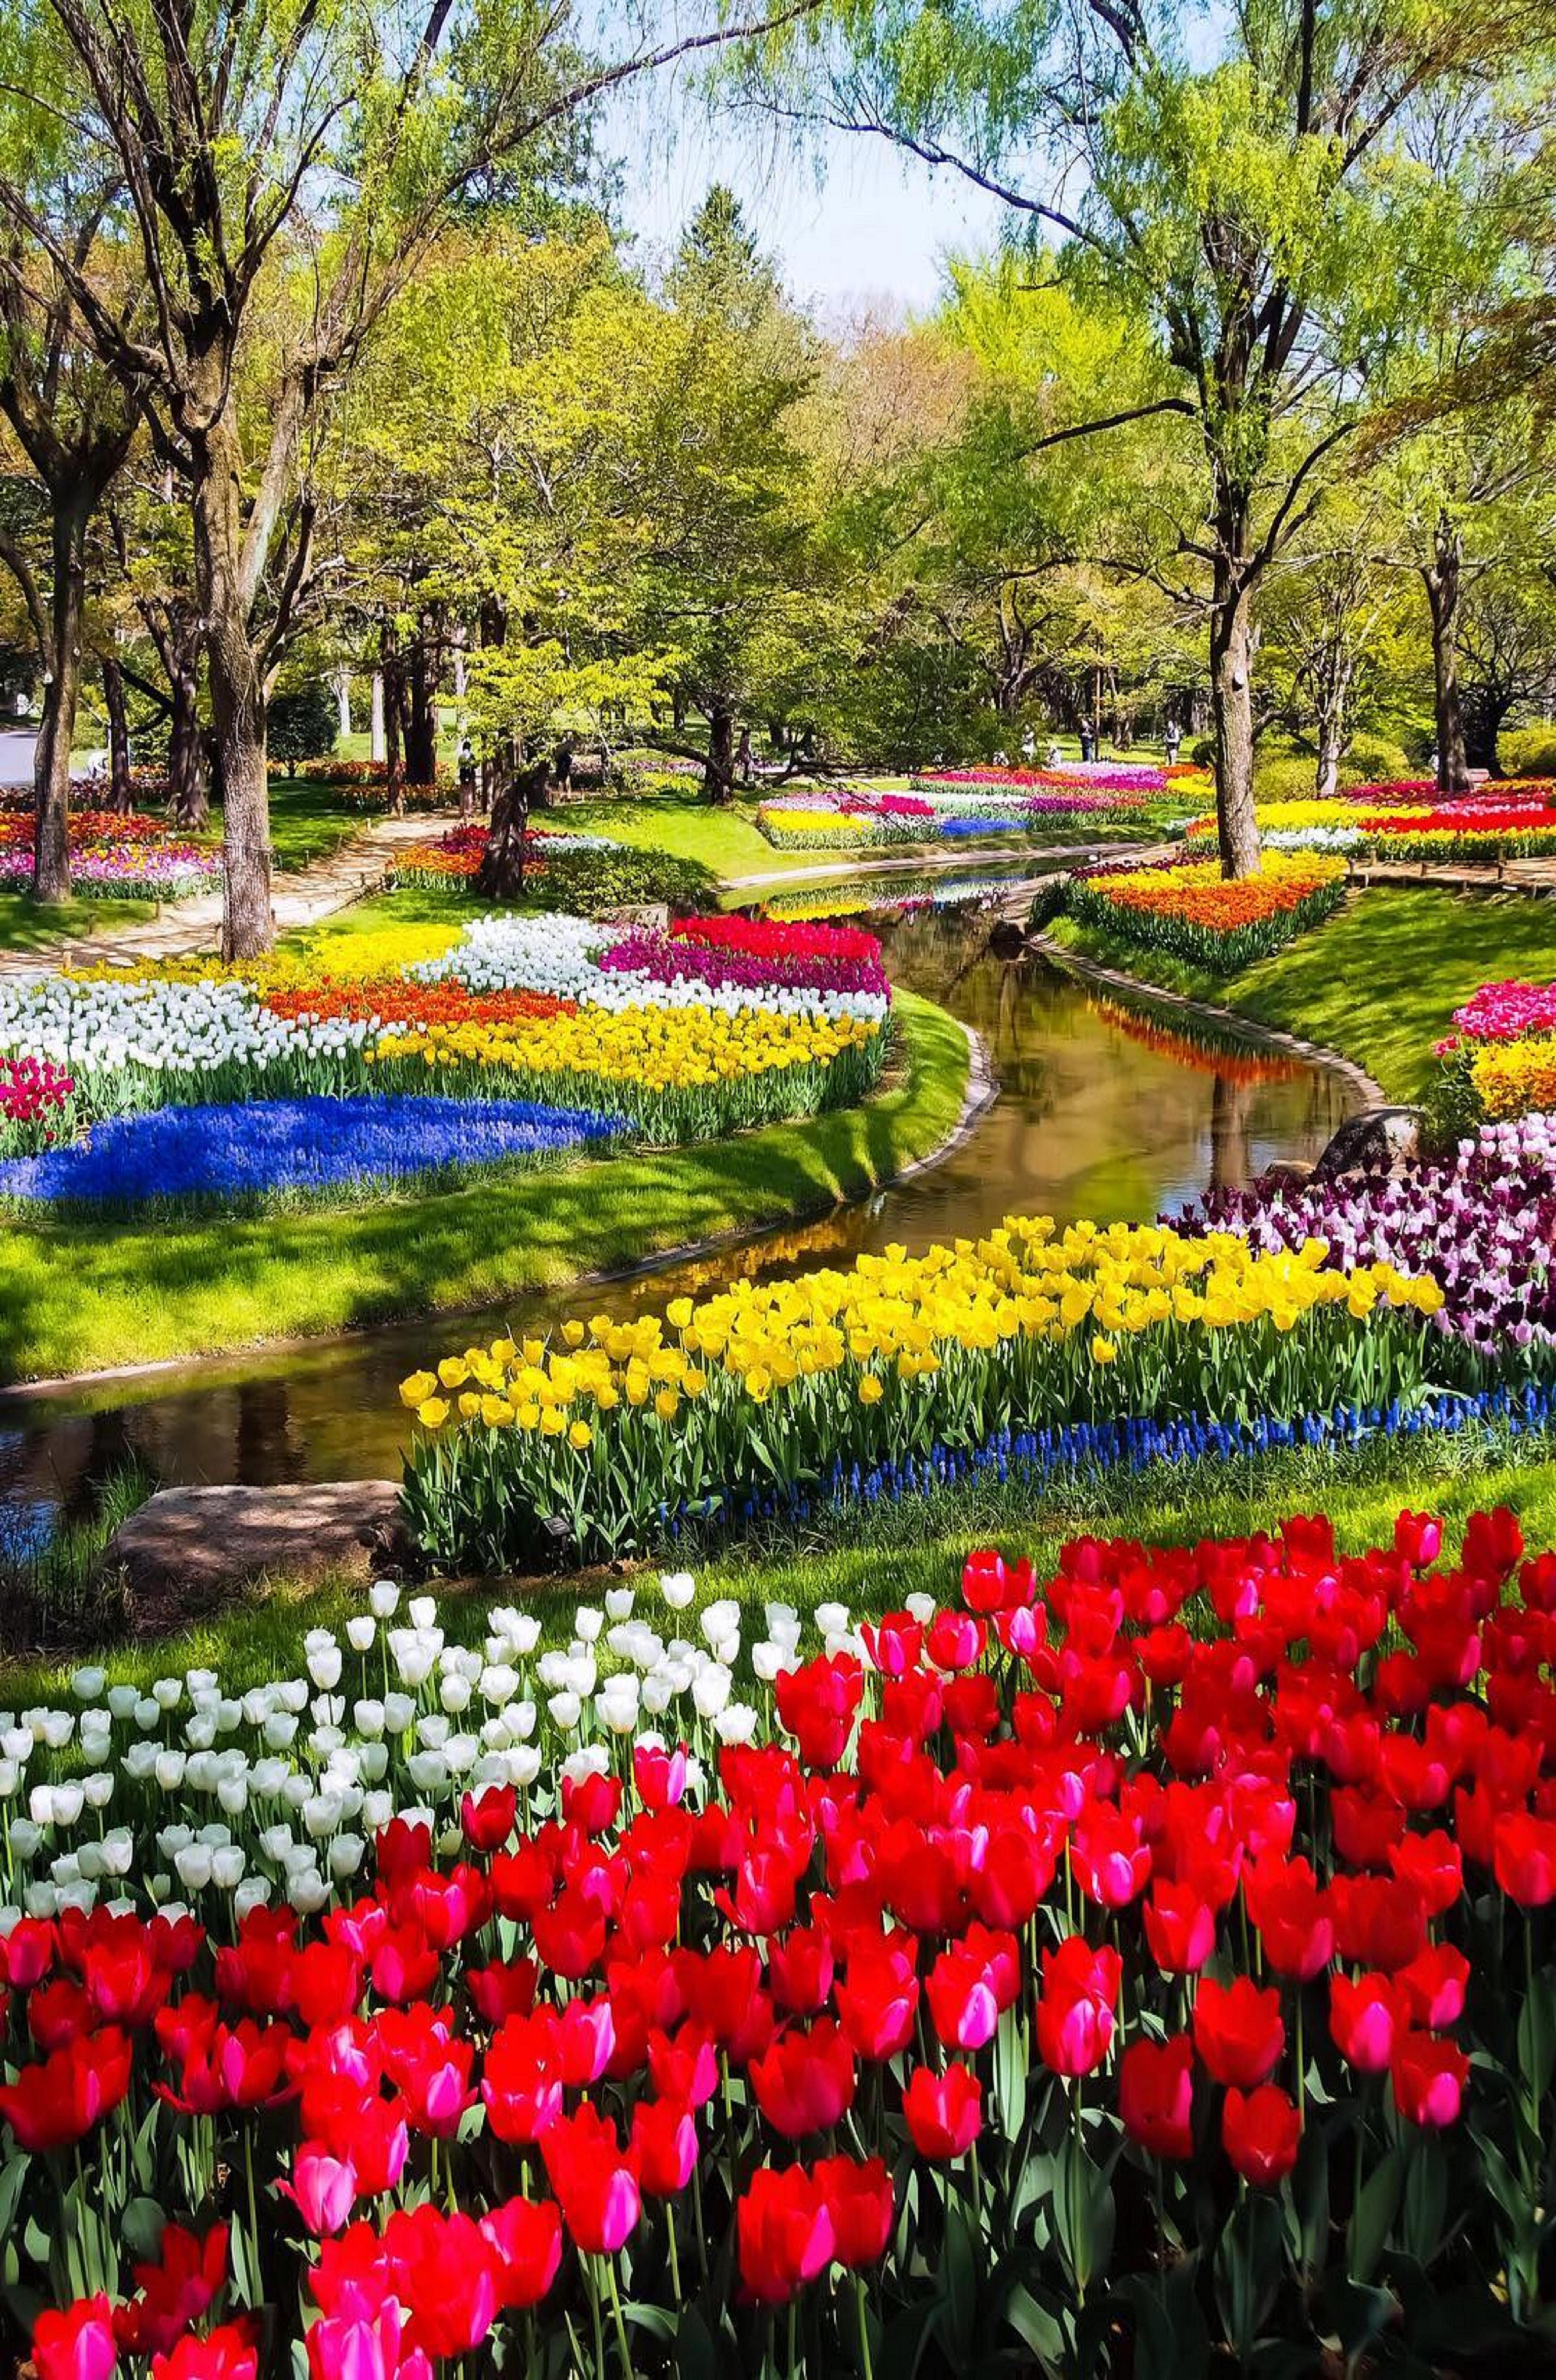 735343845232f694b6d0bbe8b87d82dc - Tulip Top Gardens 2019 Tulip Top Gardens 5 October